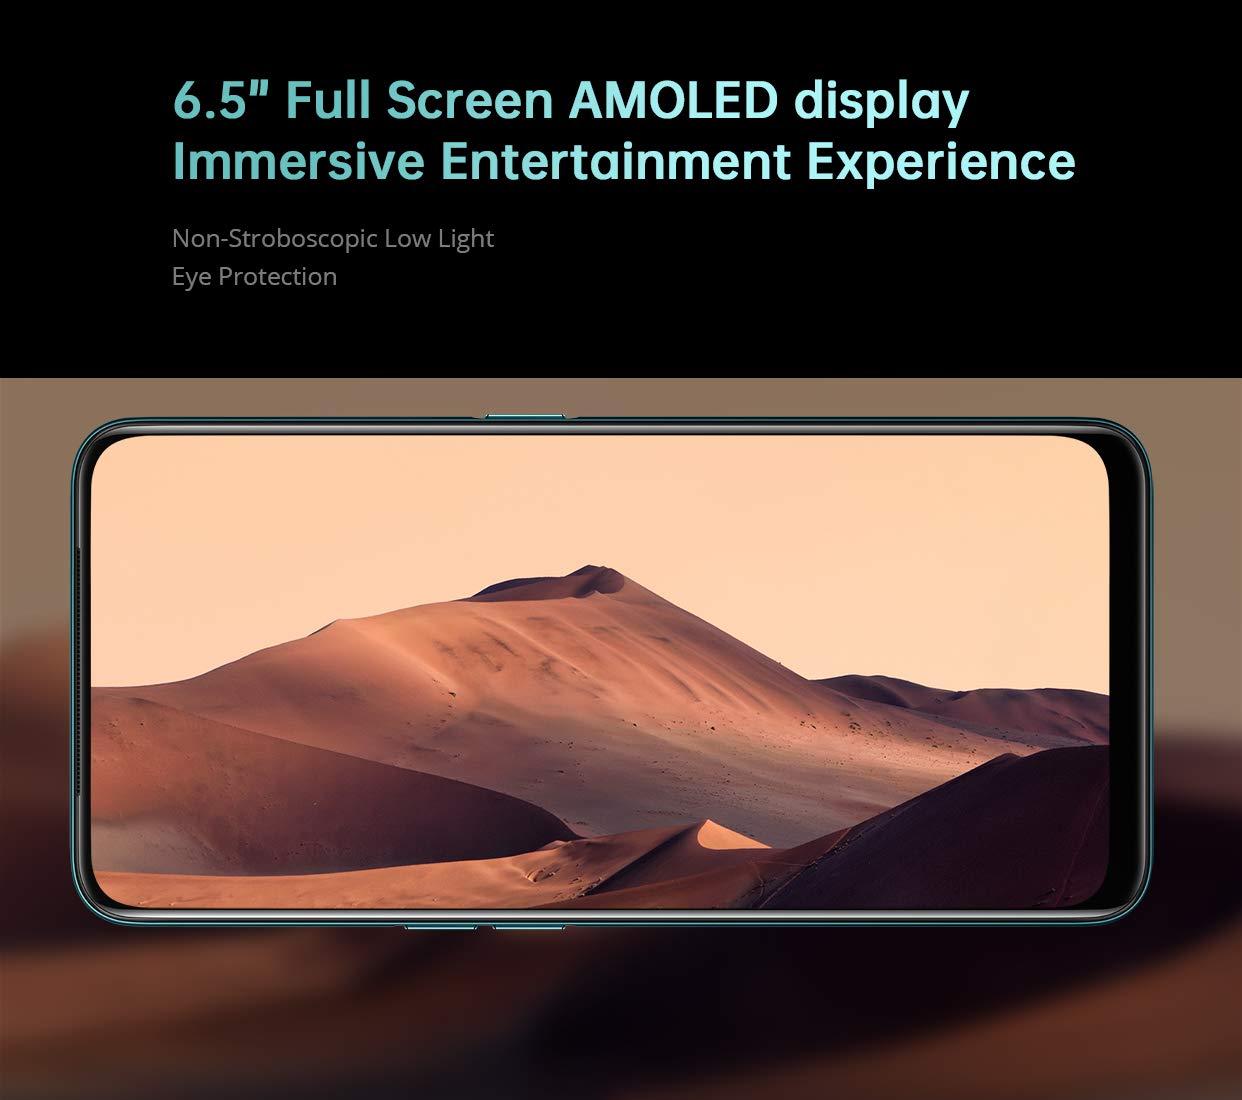 An edge-to-edge, bezel-less AMOLED display